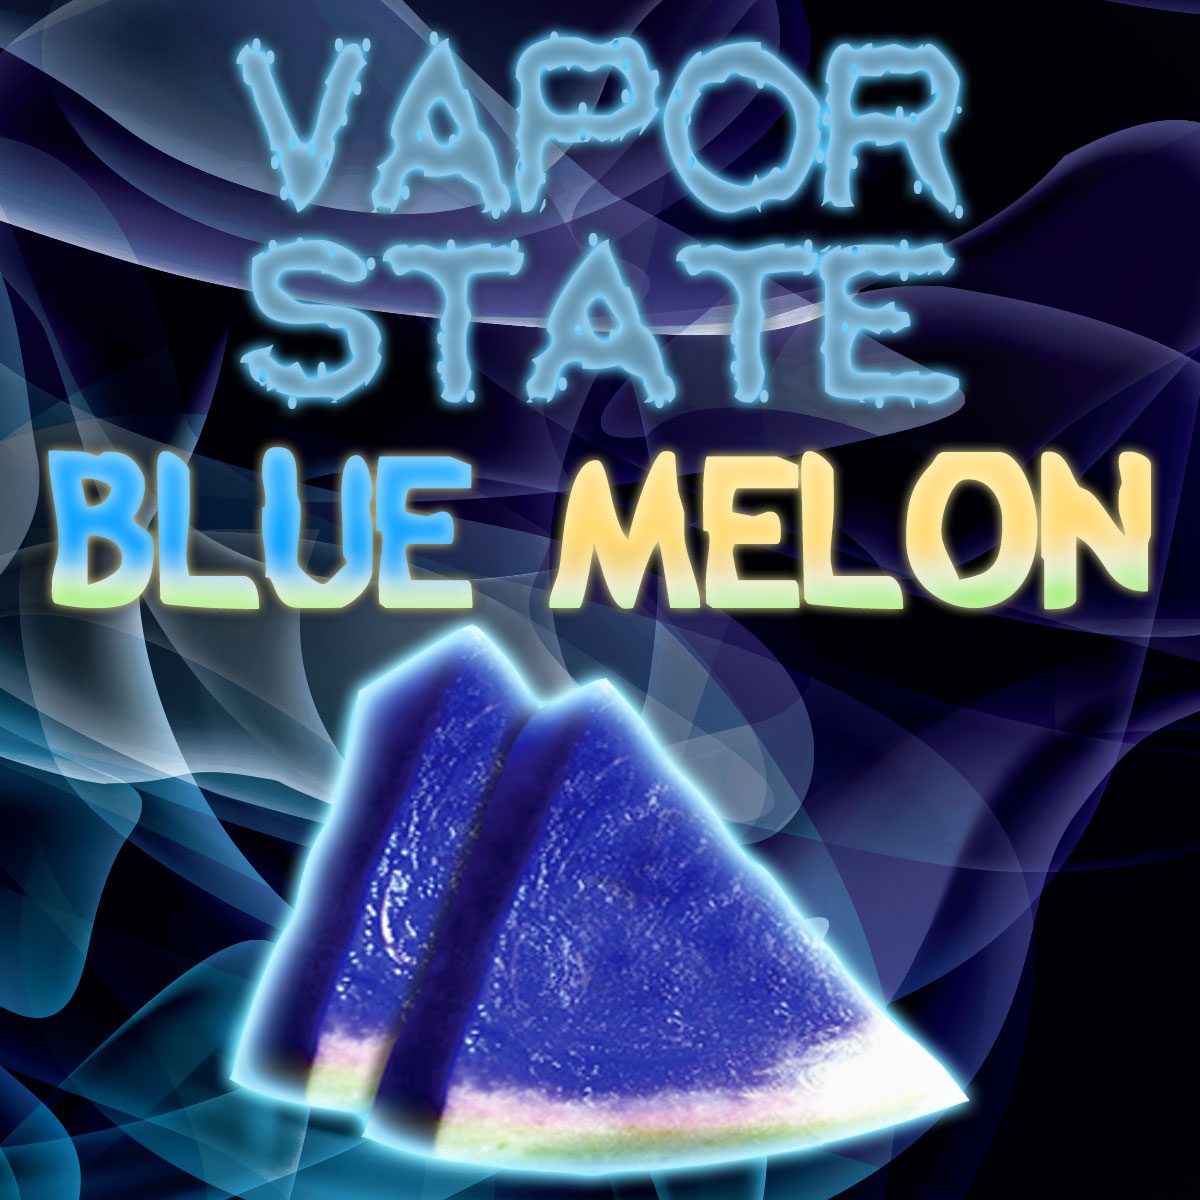 Blue-Melon.jpg